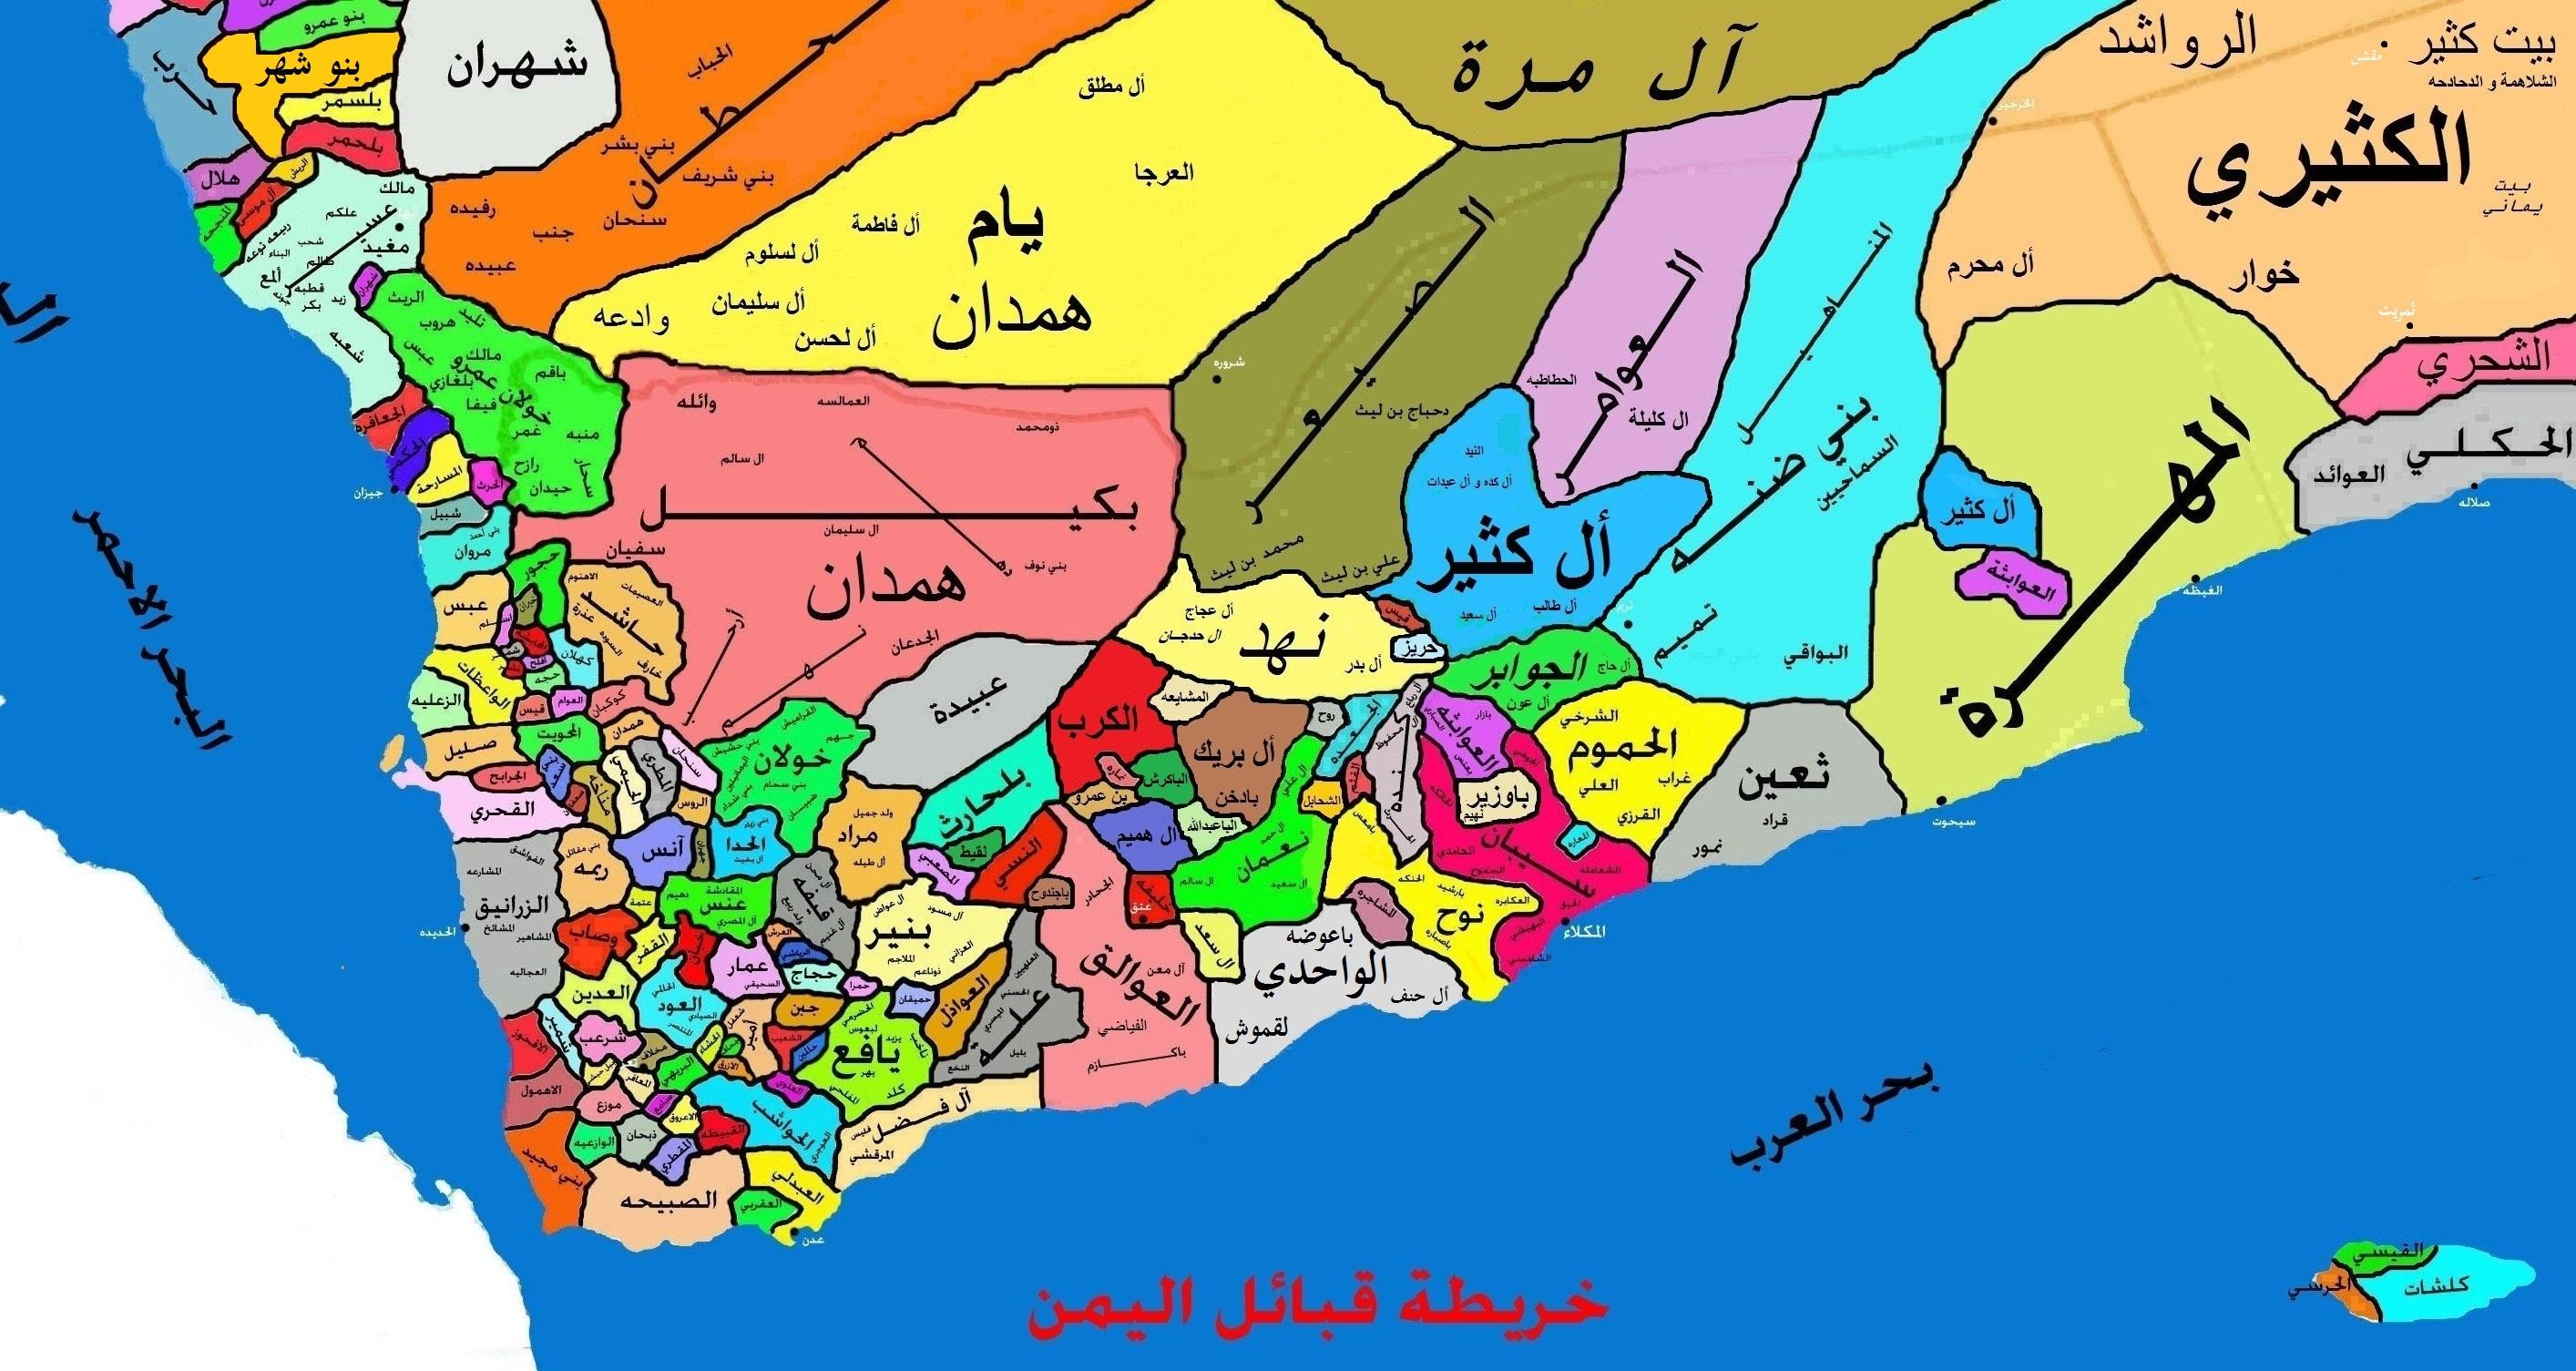 File خريطة قبائل اليمن و خريطة حدود القبائل اليمنية Jpg Wikimedia Commons